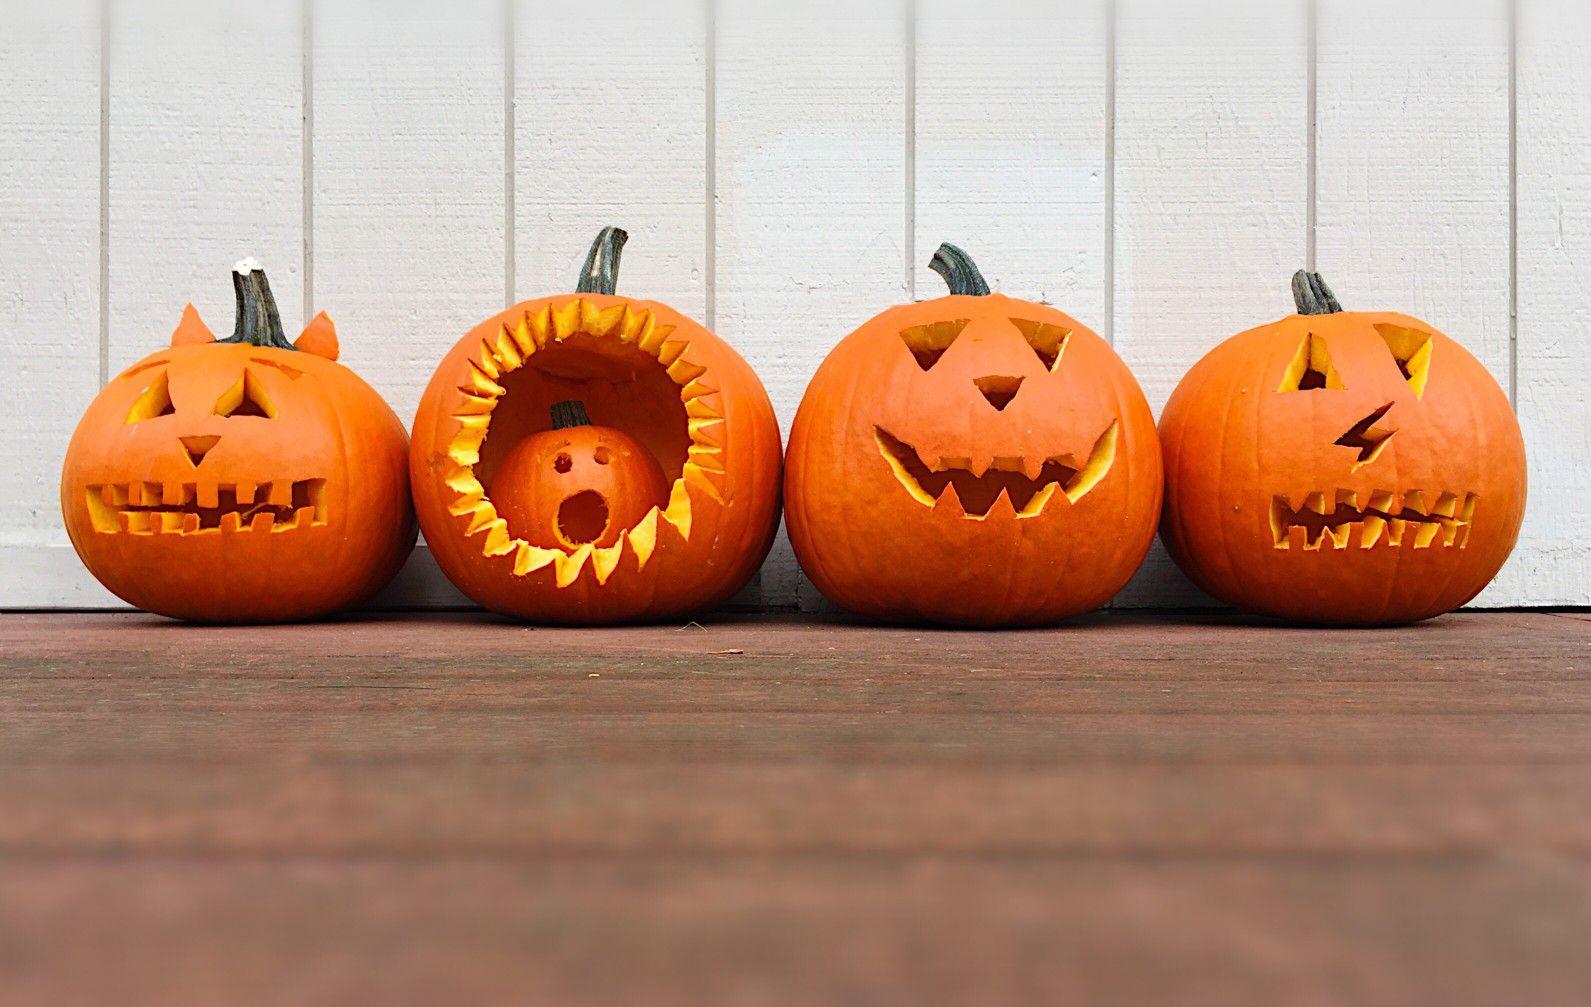 8 Tips To Keep Your Halloween Pumpkin Fresh